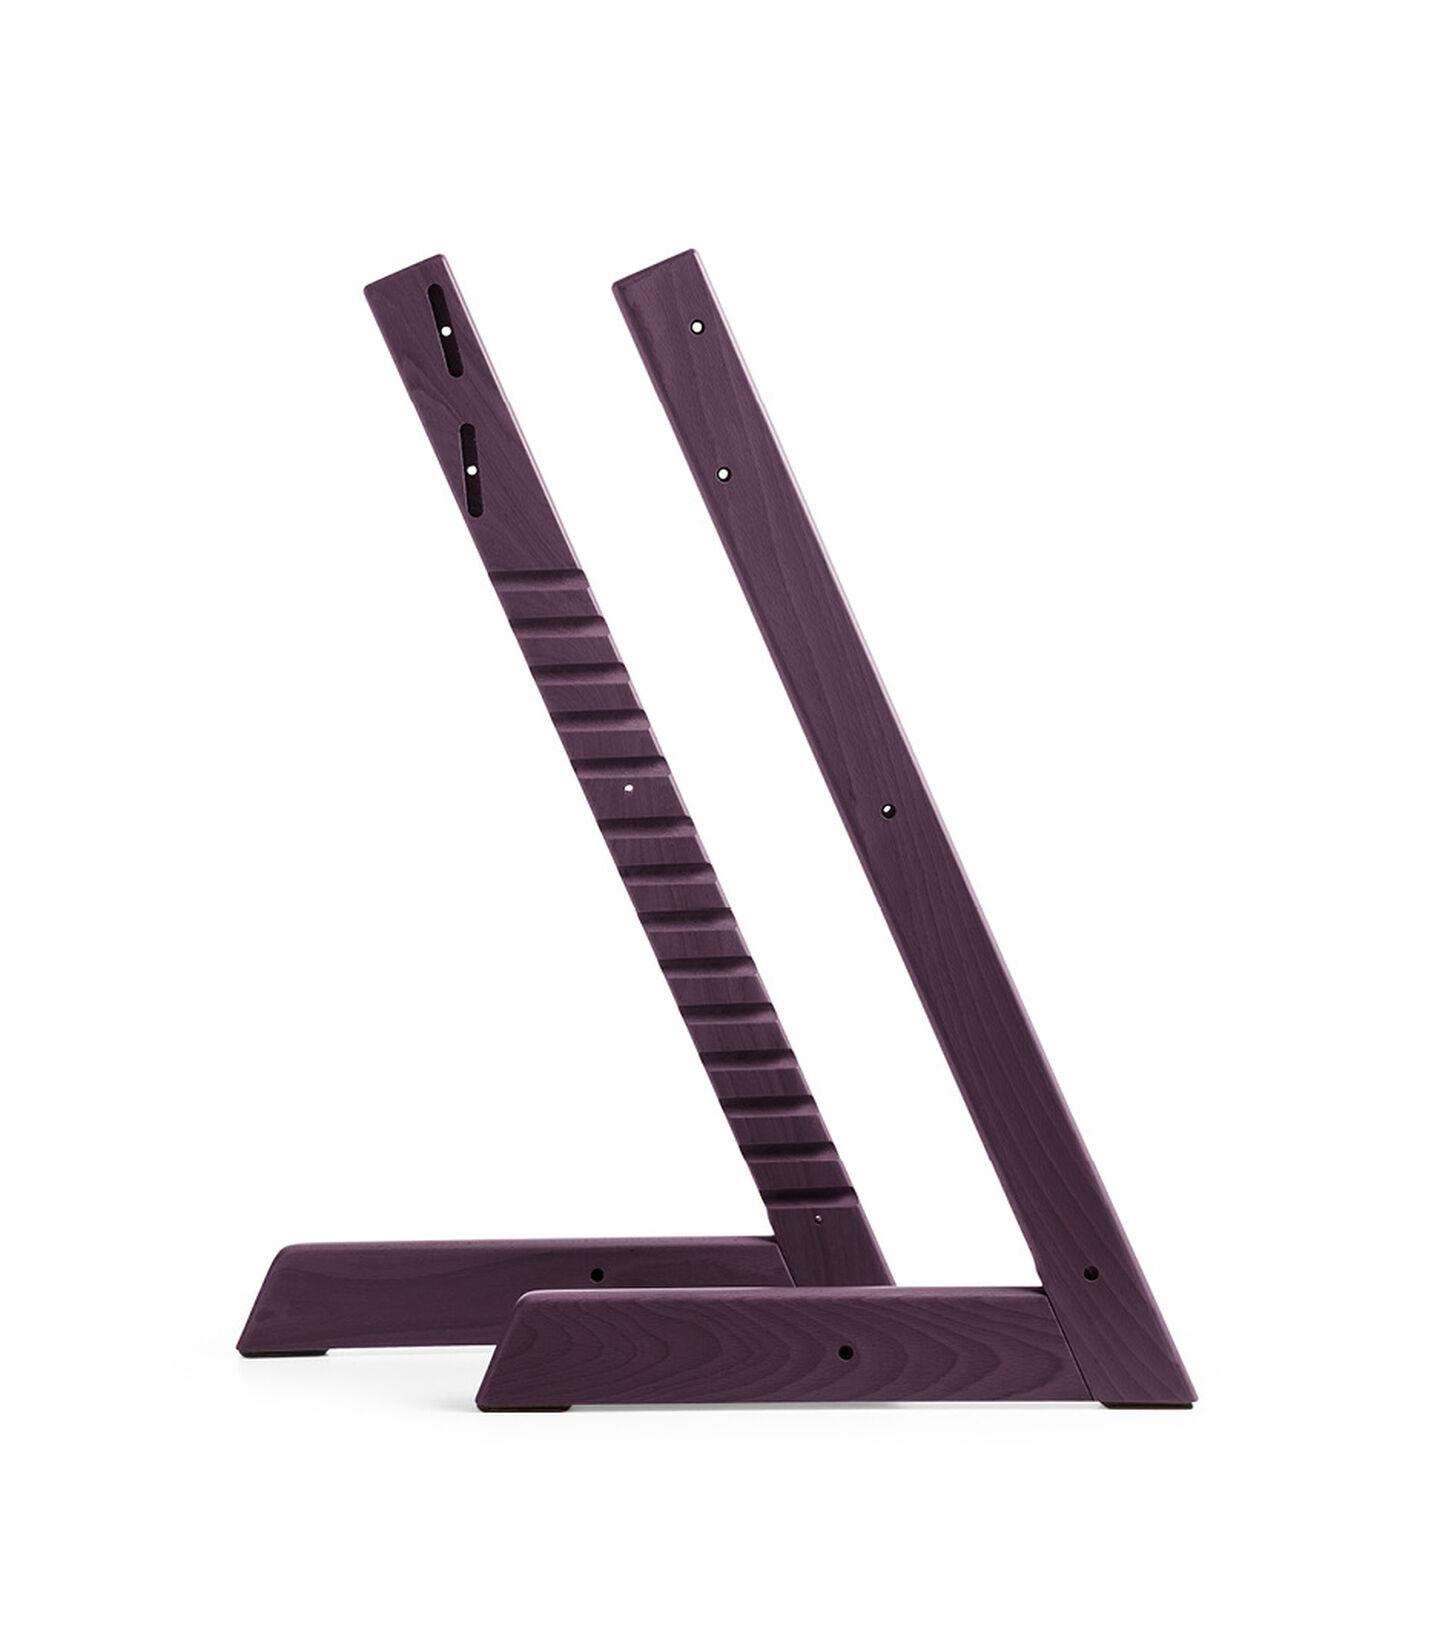 Tripp Trapp® Siderunner set Plum Purple, Ciruela, mainview view 2